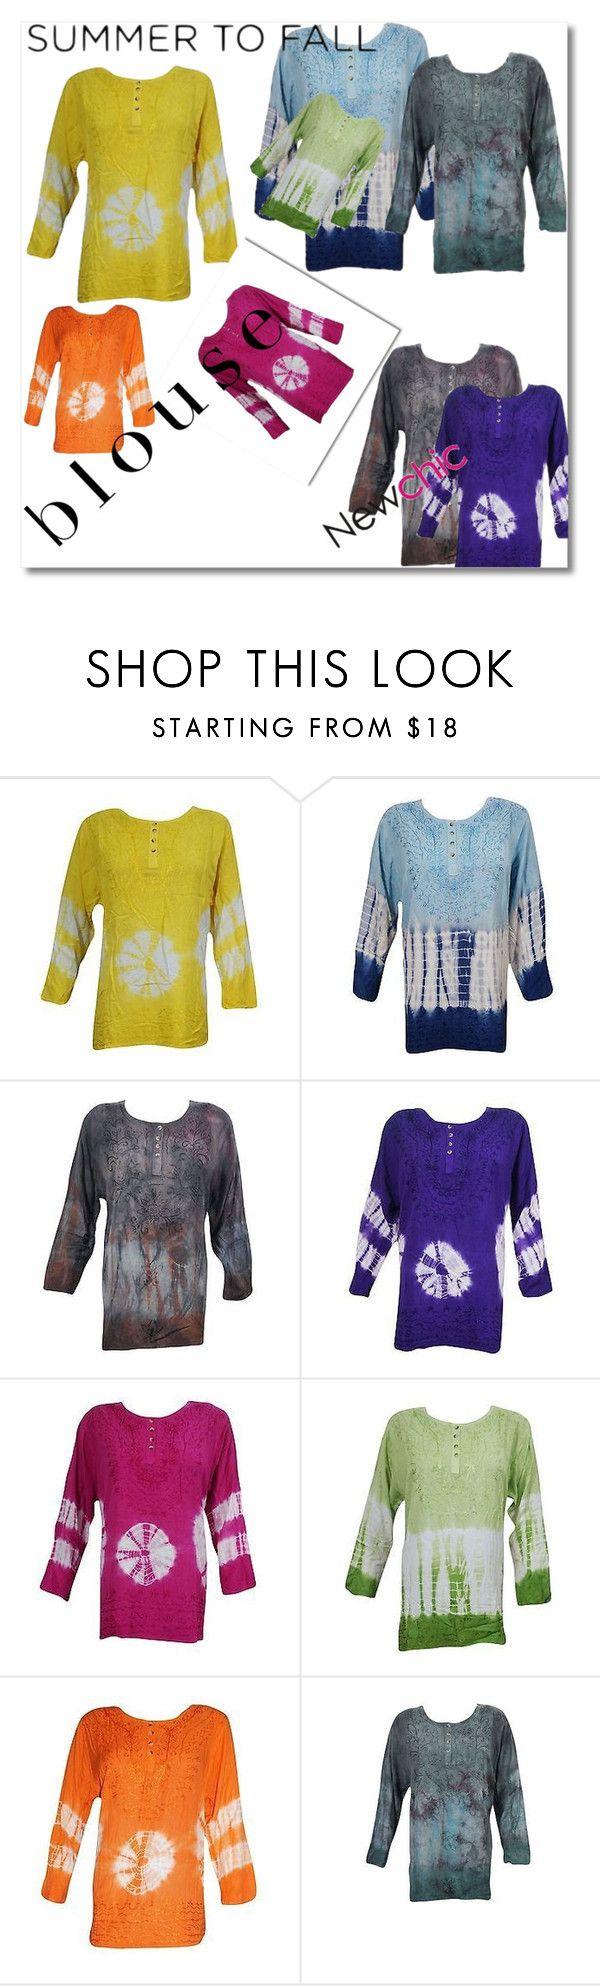 Boho Tie Dye Blouse Tops by baydeals on Polyvore  http://stores.ebay.com/mogulgallery/TOPS-BLOUSES-/_i.html?_fsub=901626119&_sid=3781319&_trksid=p4634.c0.m322